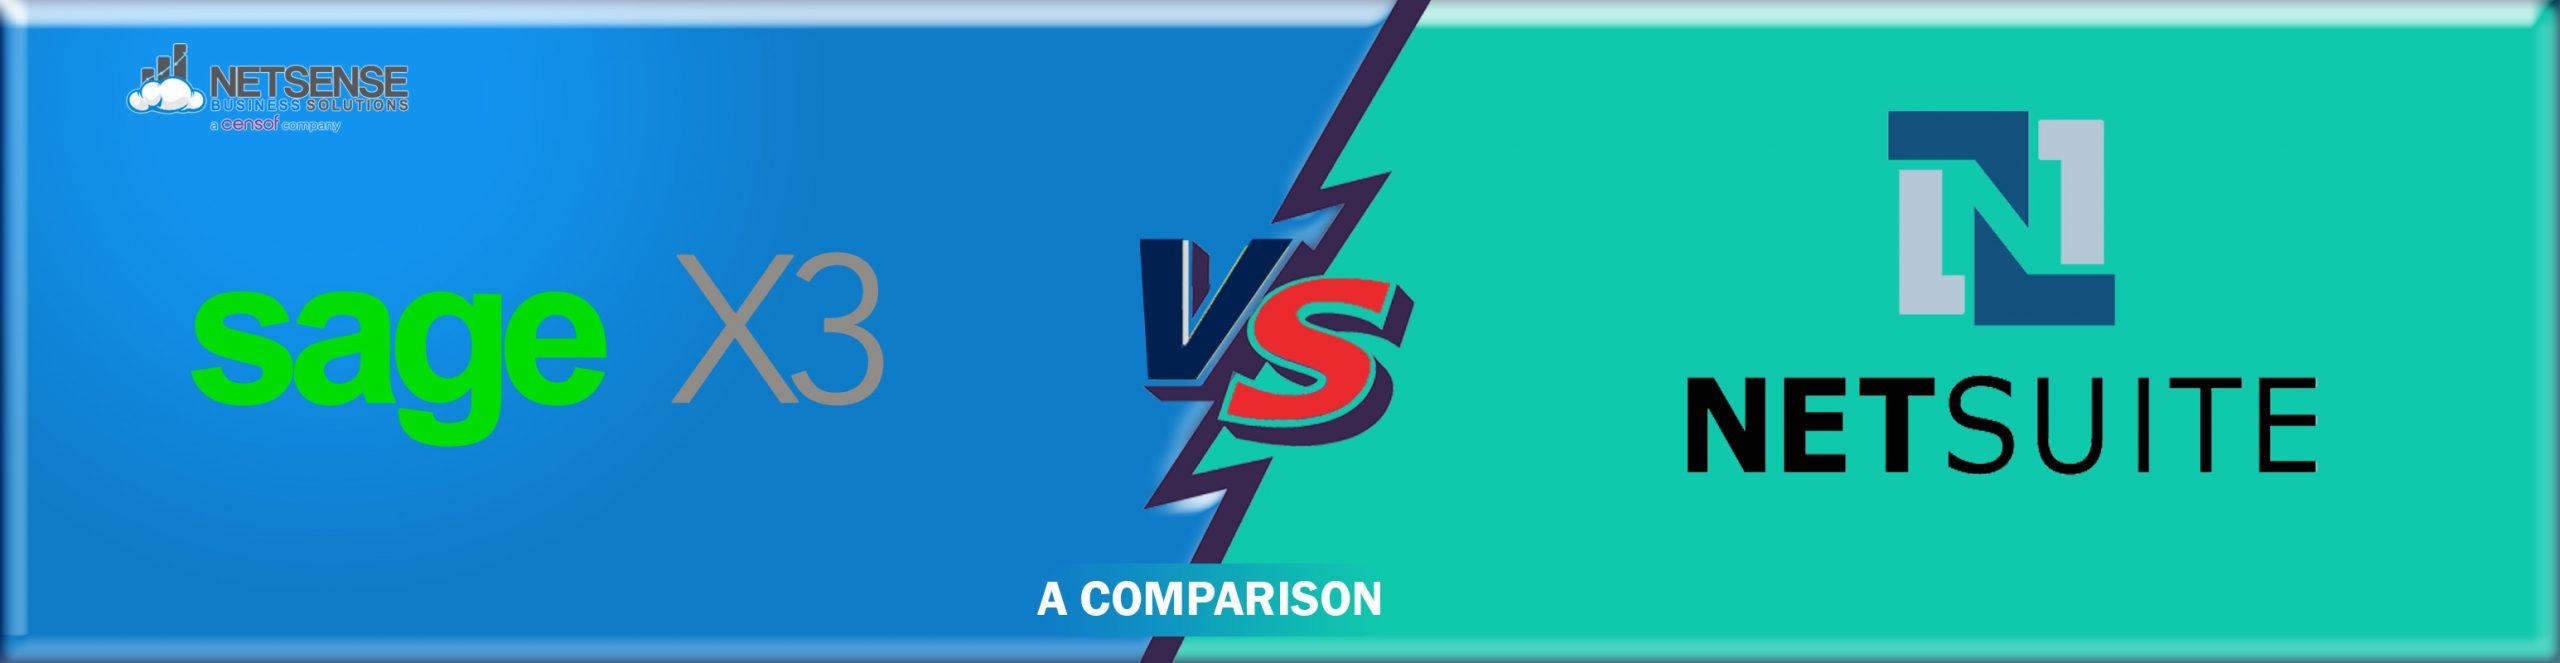 NetSuite vs Sage X3 Comparison